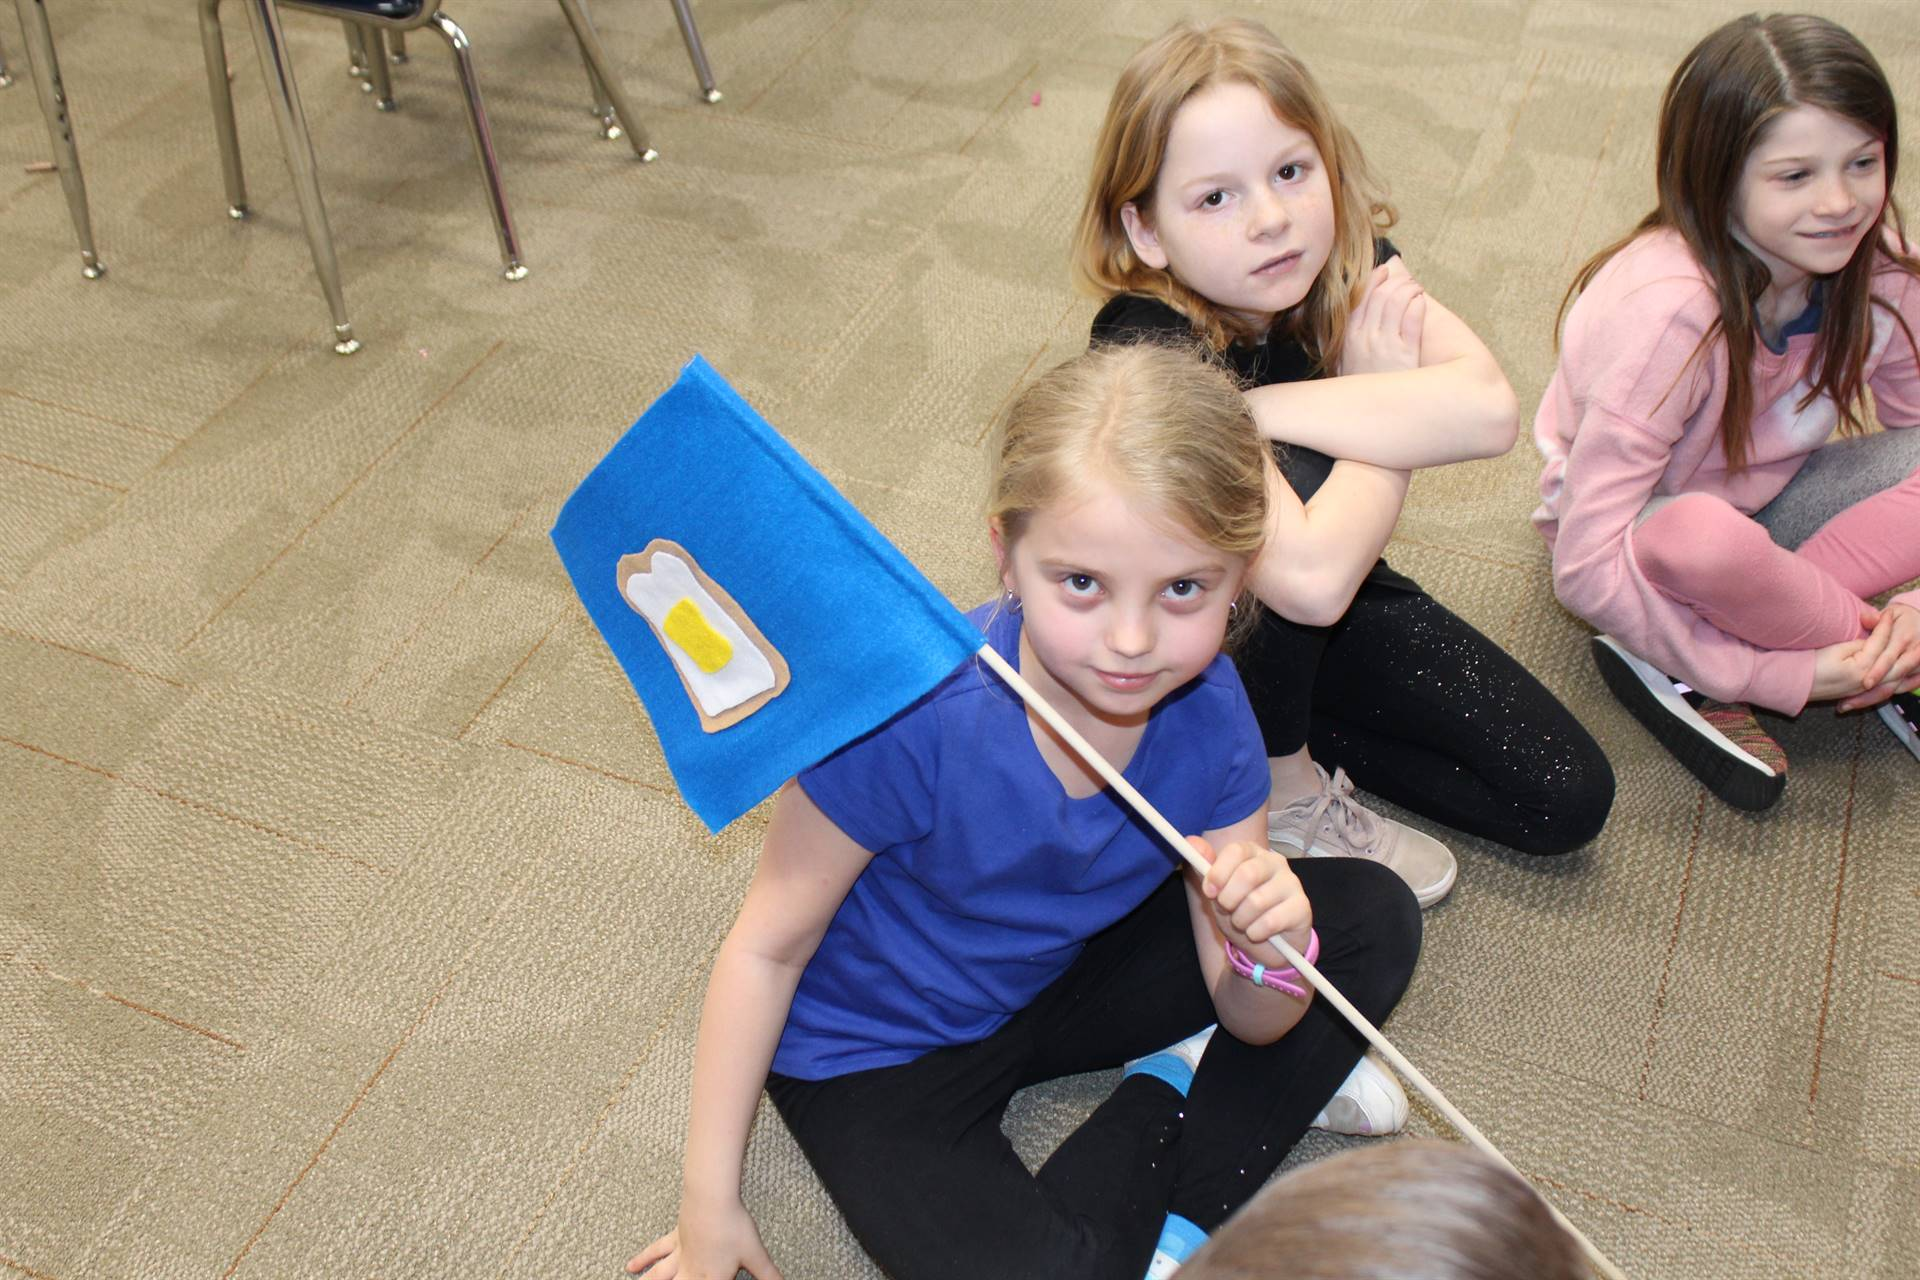 three students sitting on the floor